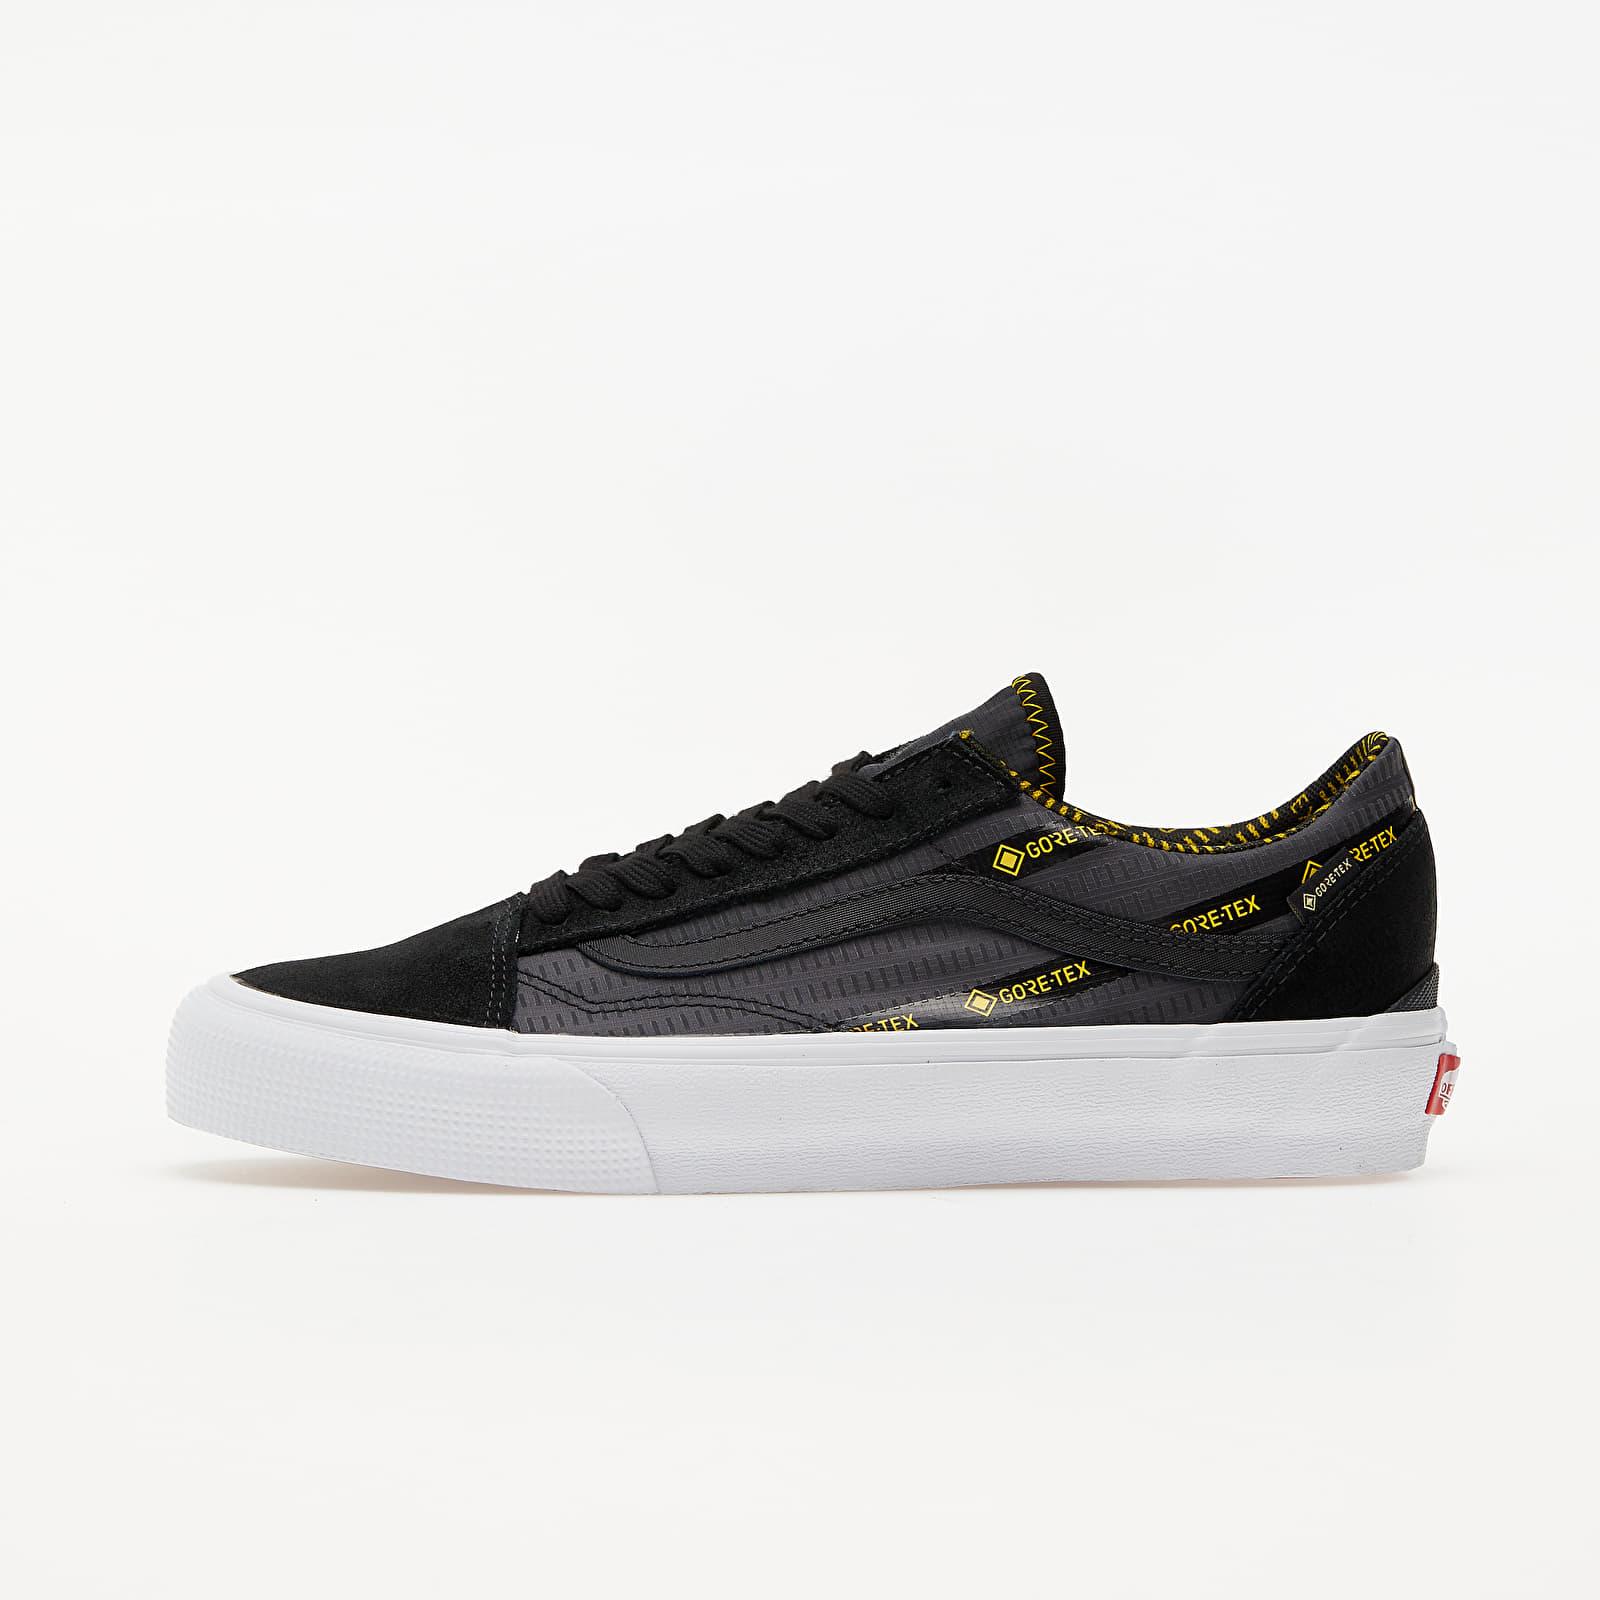 Men's shoes Vans Old Skool Gore-Tex (Gore-Tex) Black/ Lemon Chrome